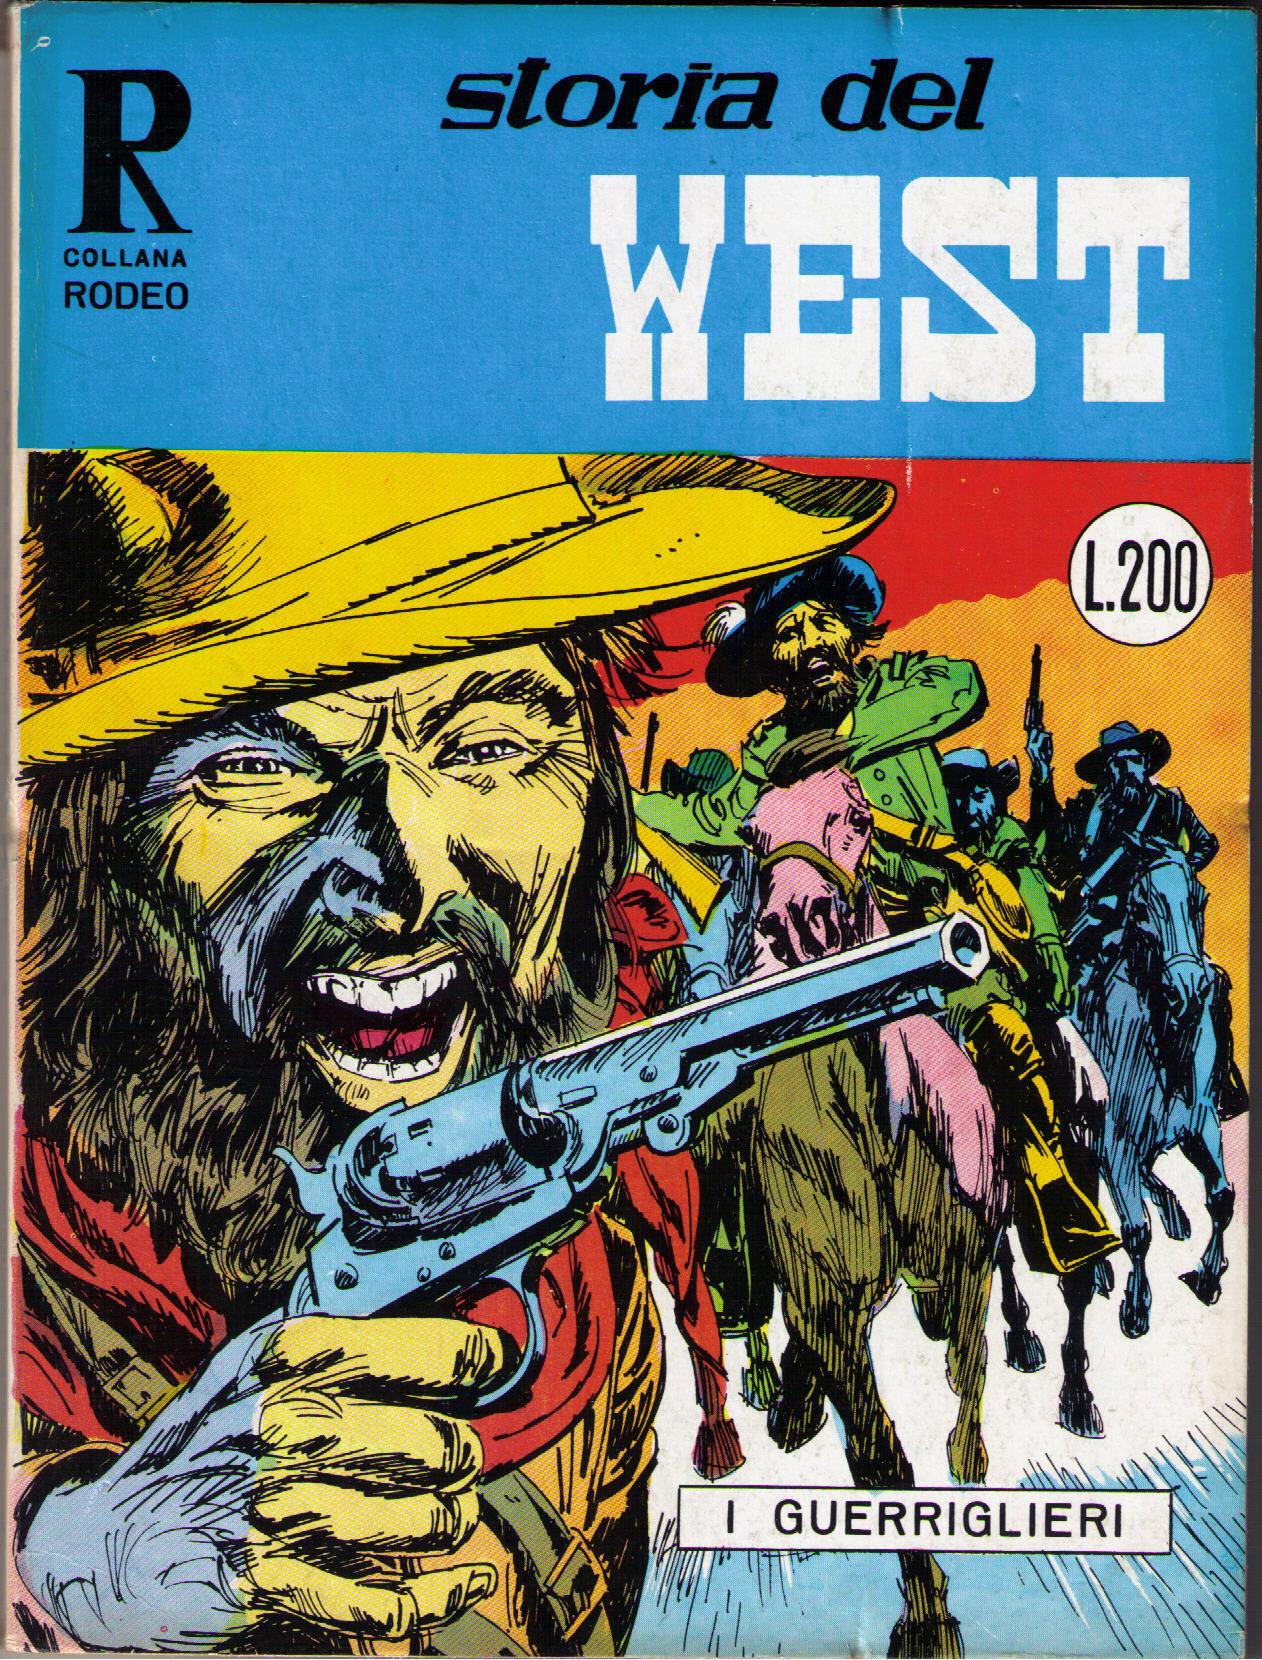 Storia del west n.25 (Collana Rodeo n.54)